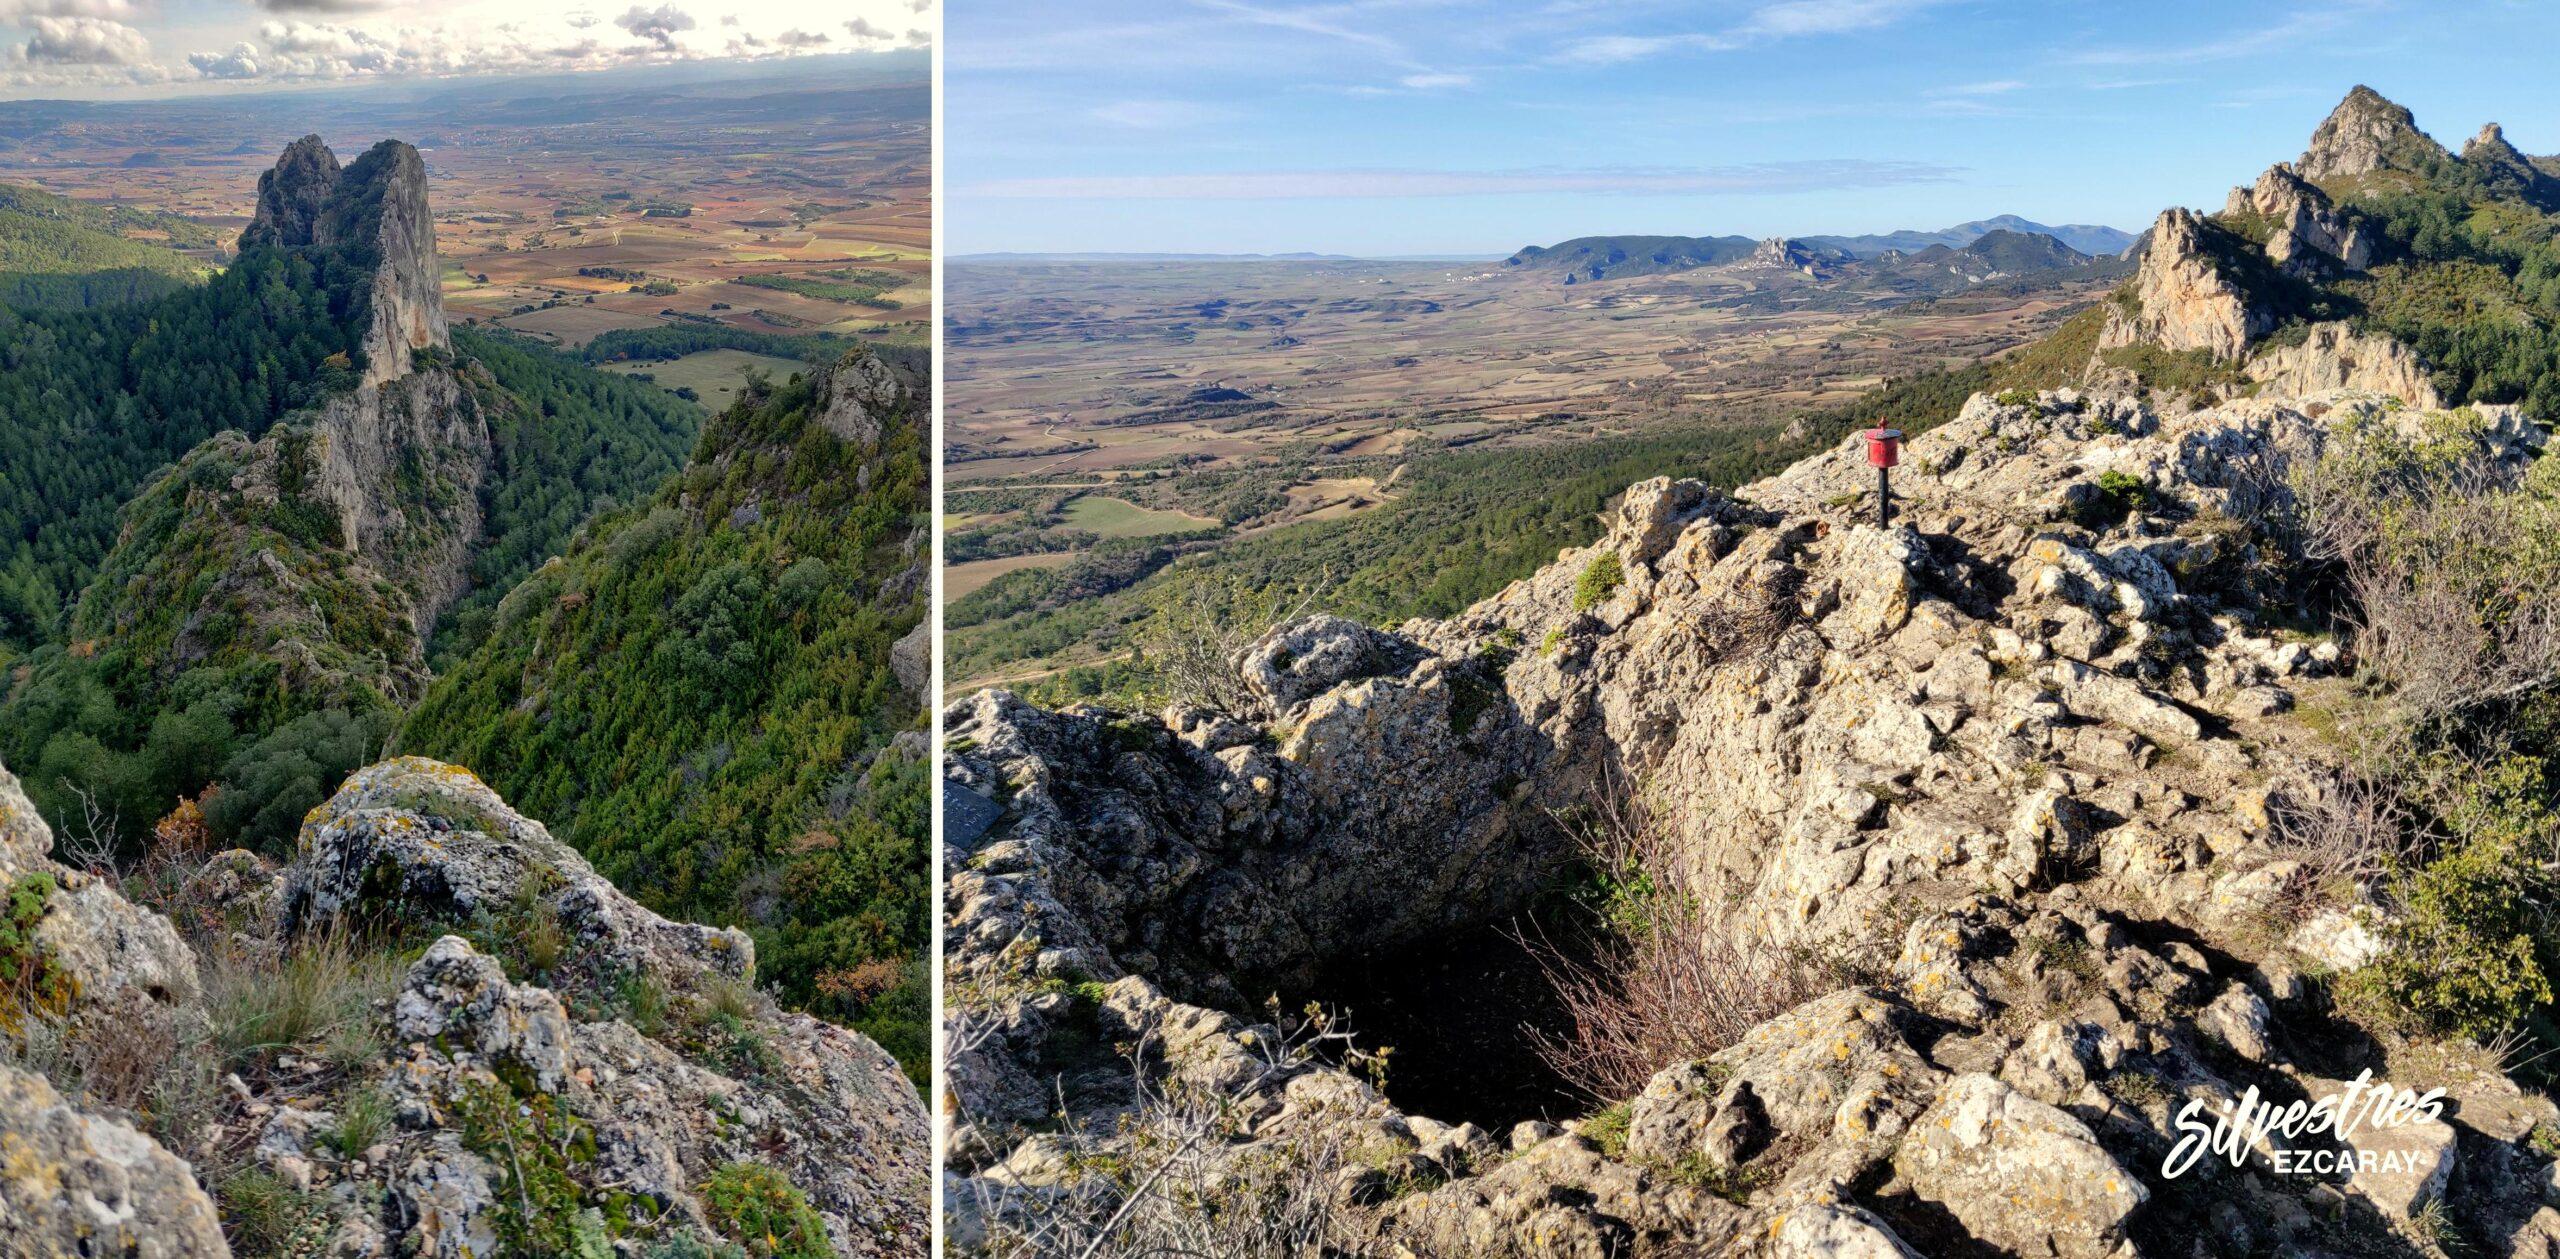 peñas_jembres_obarenes_escalada_subida_leyenda_guia_de_montaña